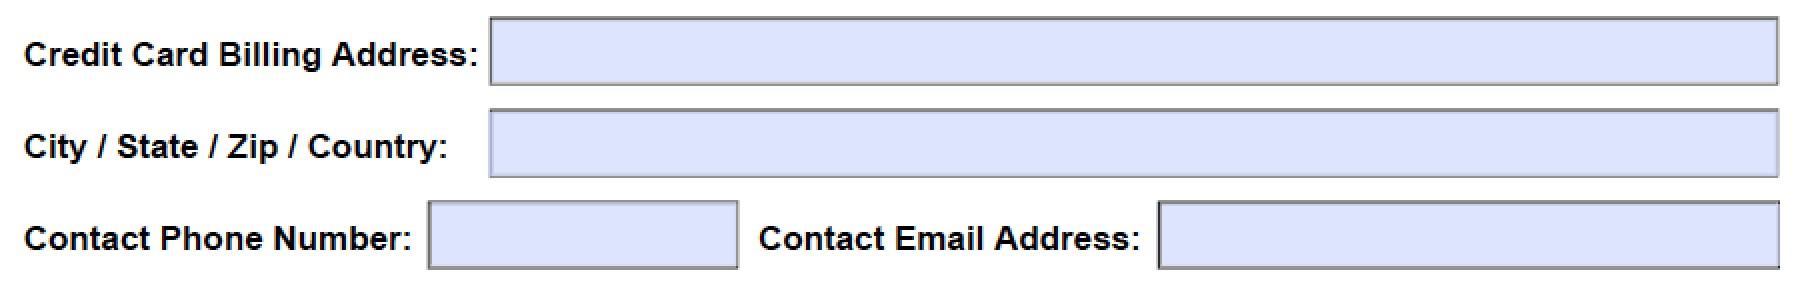 download hyatt credit card authorization form template